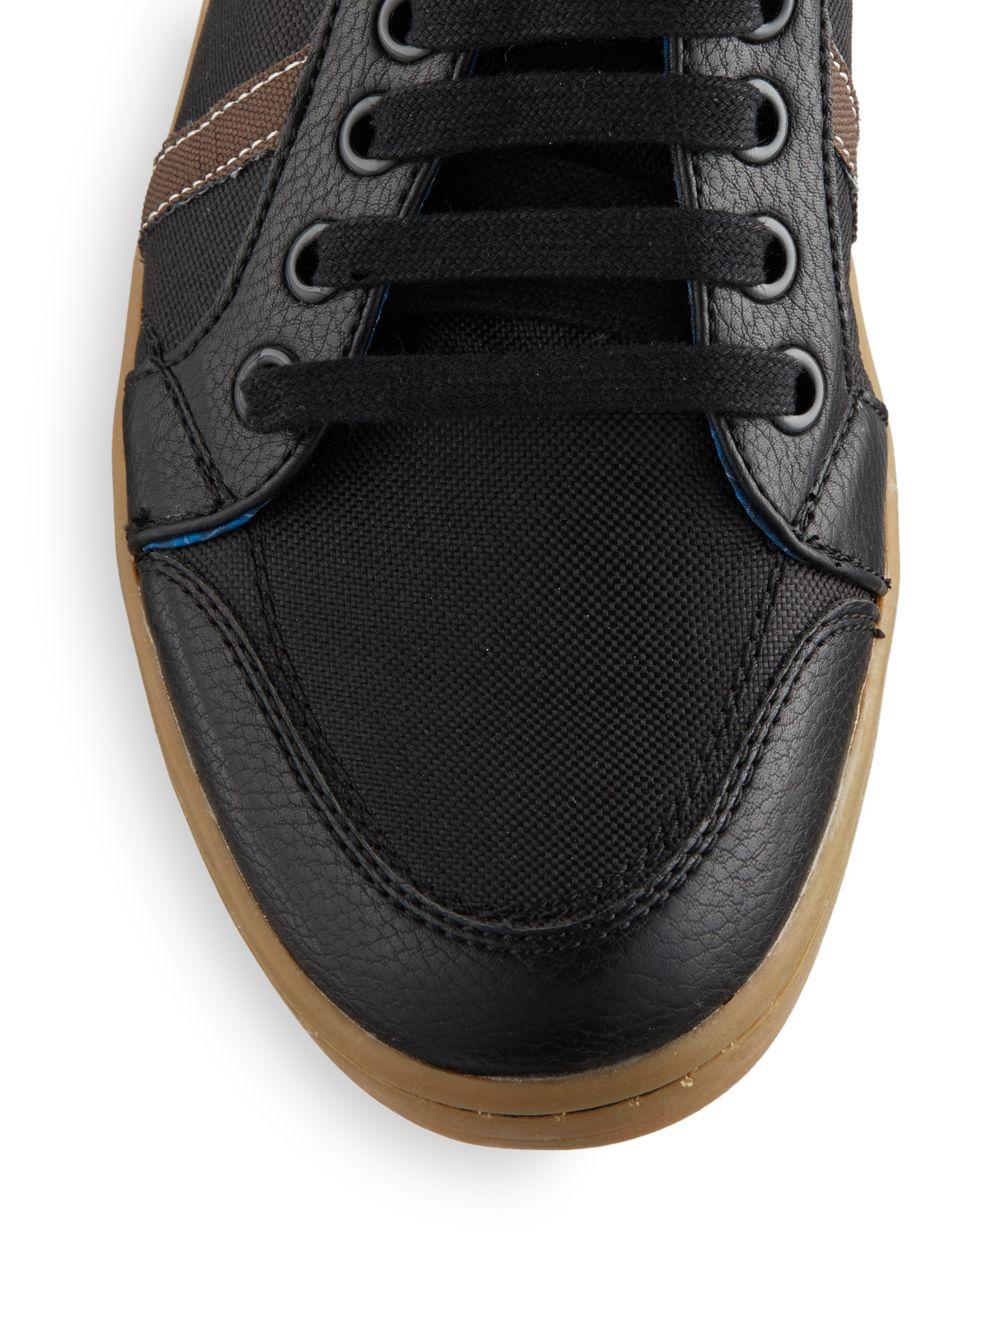 ben sherman knox sneaker in black for men lyst